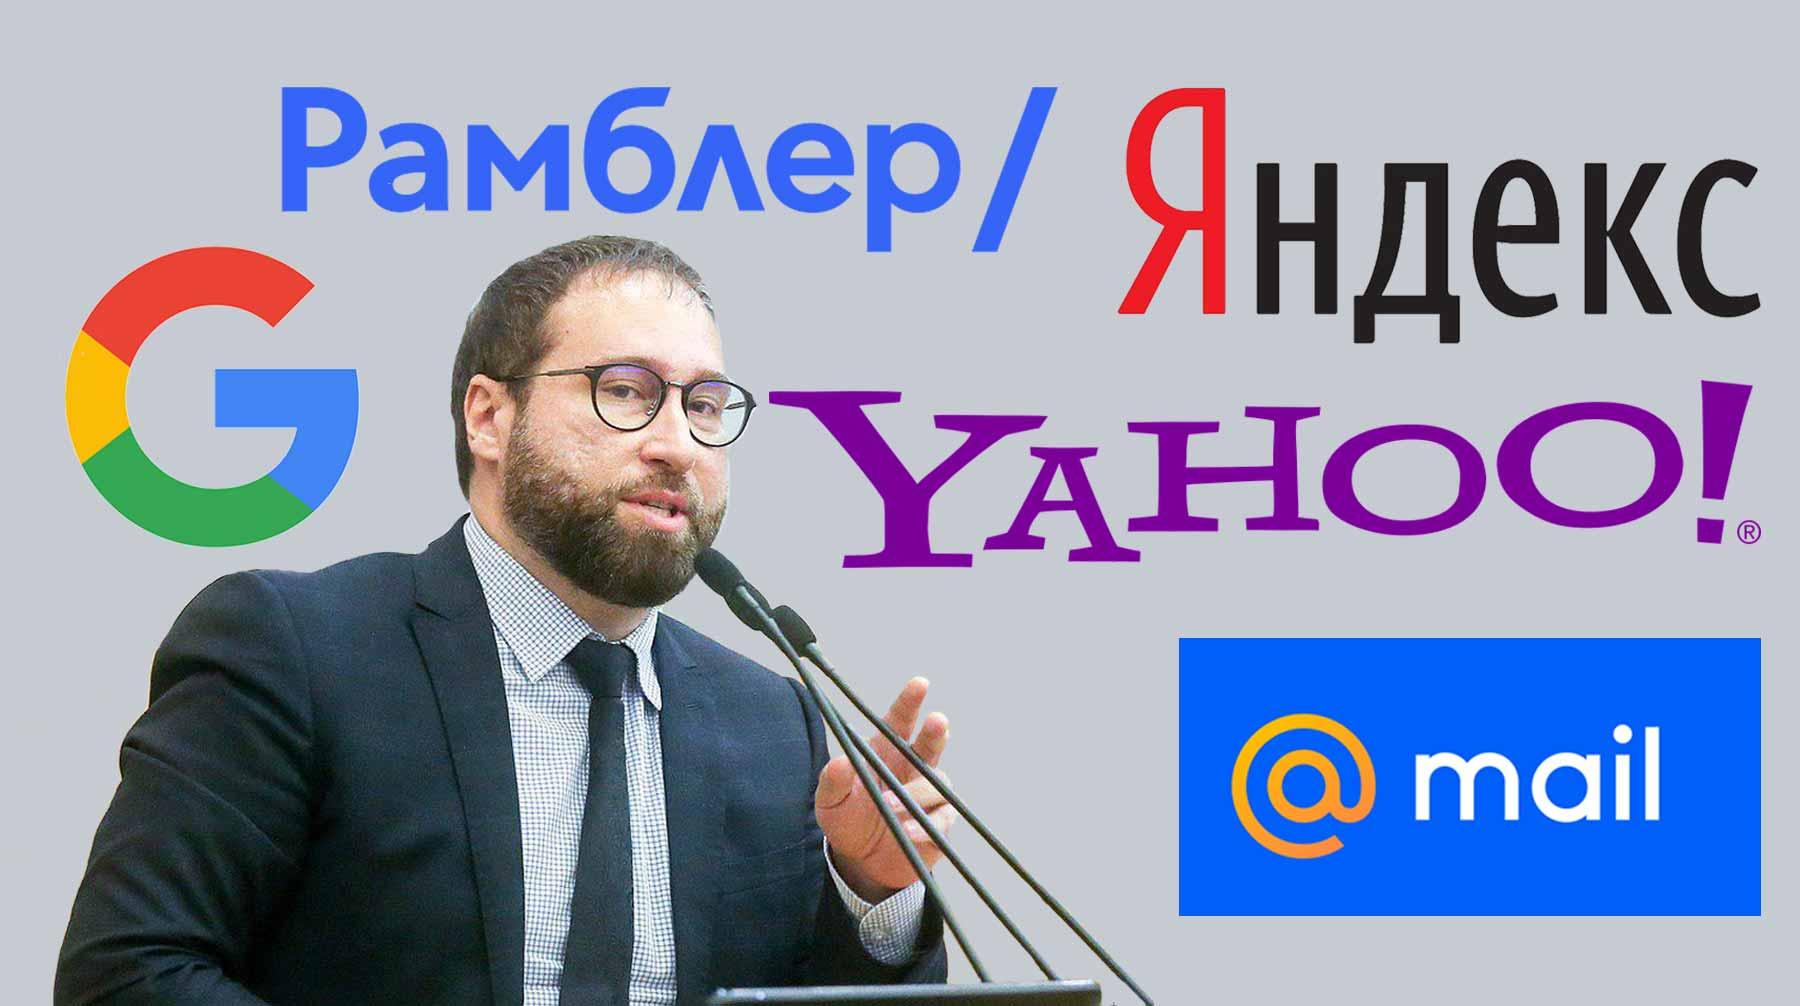 Акции «Яндекса» упали на 18% из-за нового законопроекта о значимых интернет-компаниях в Госдуме - 1